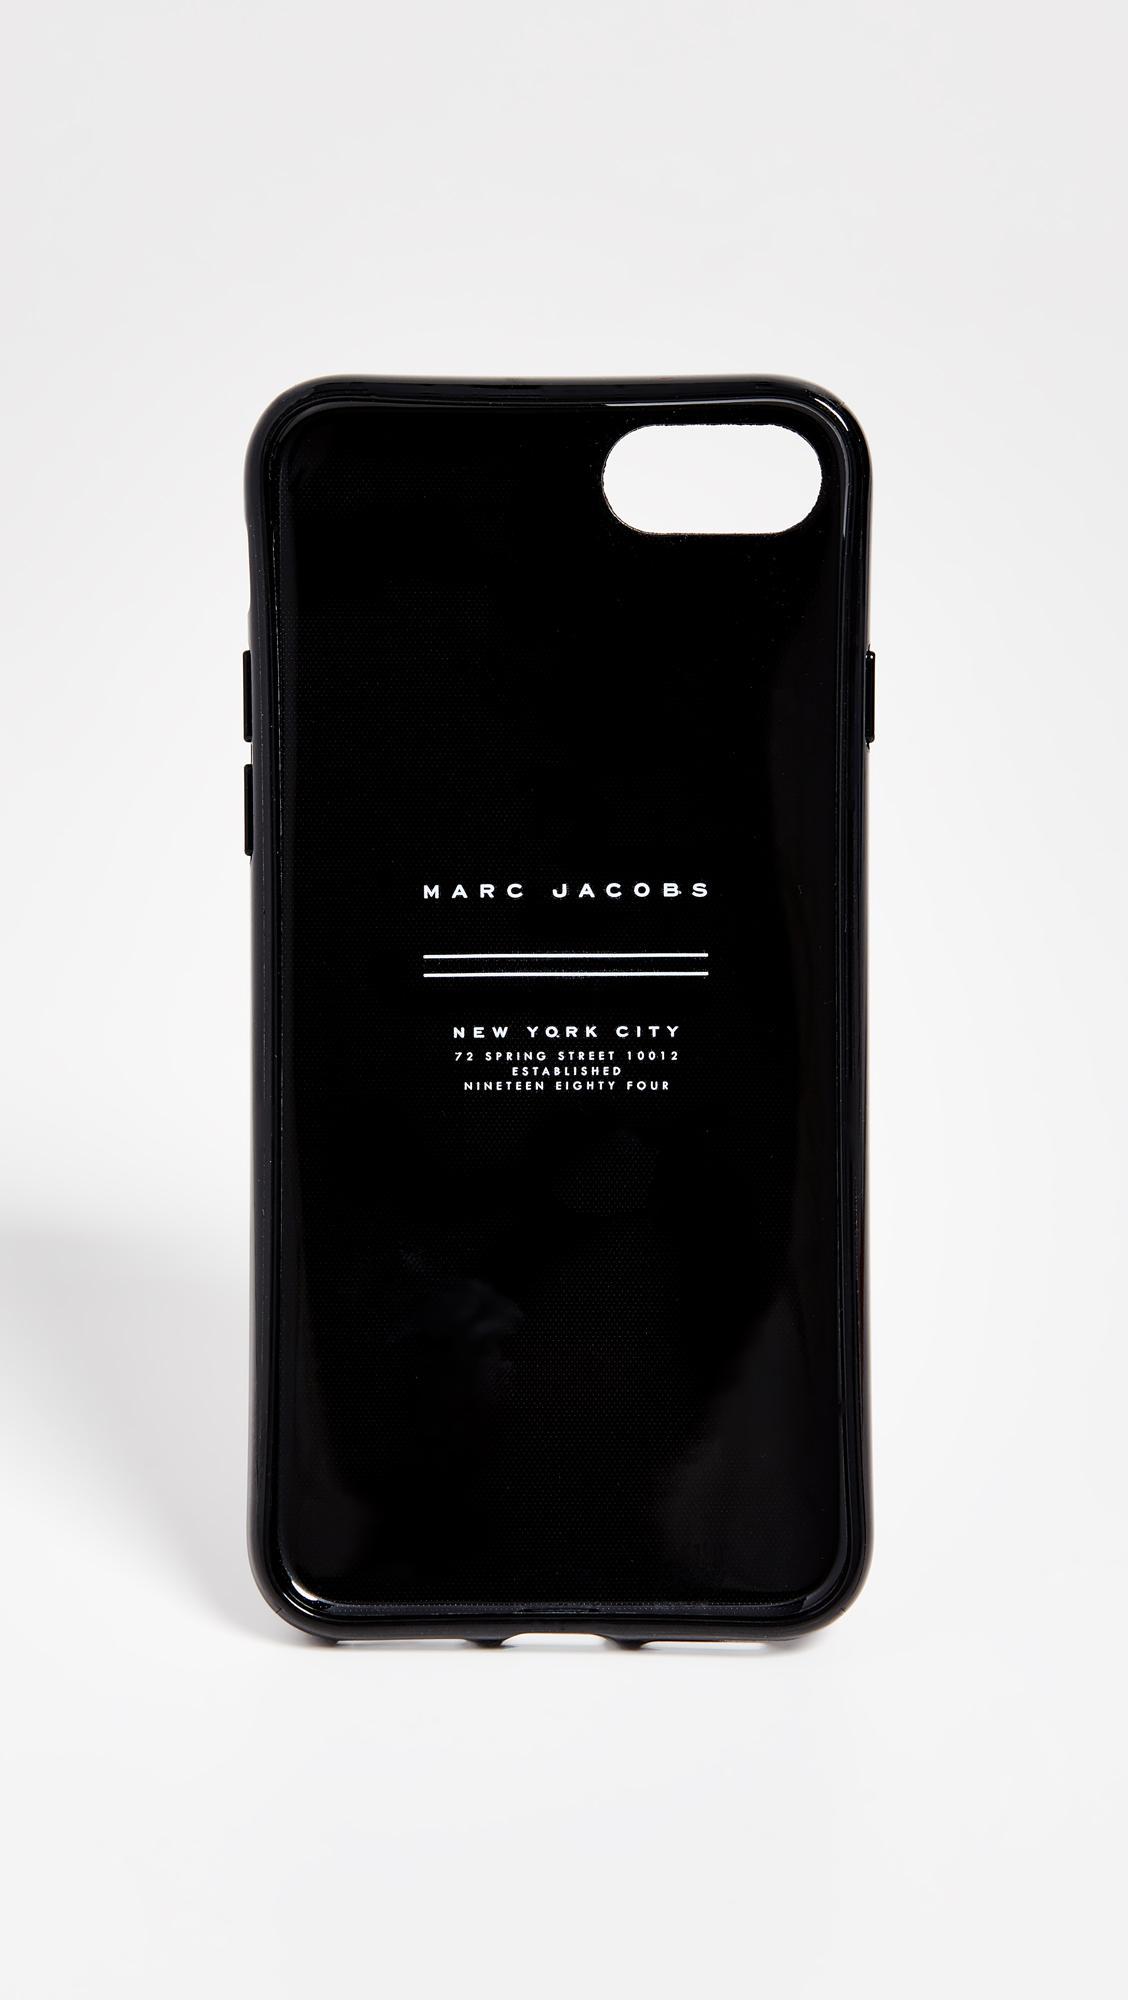 iphone 8 case marc jacobs